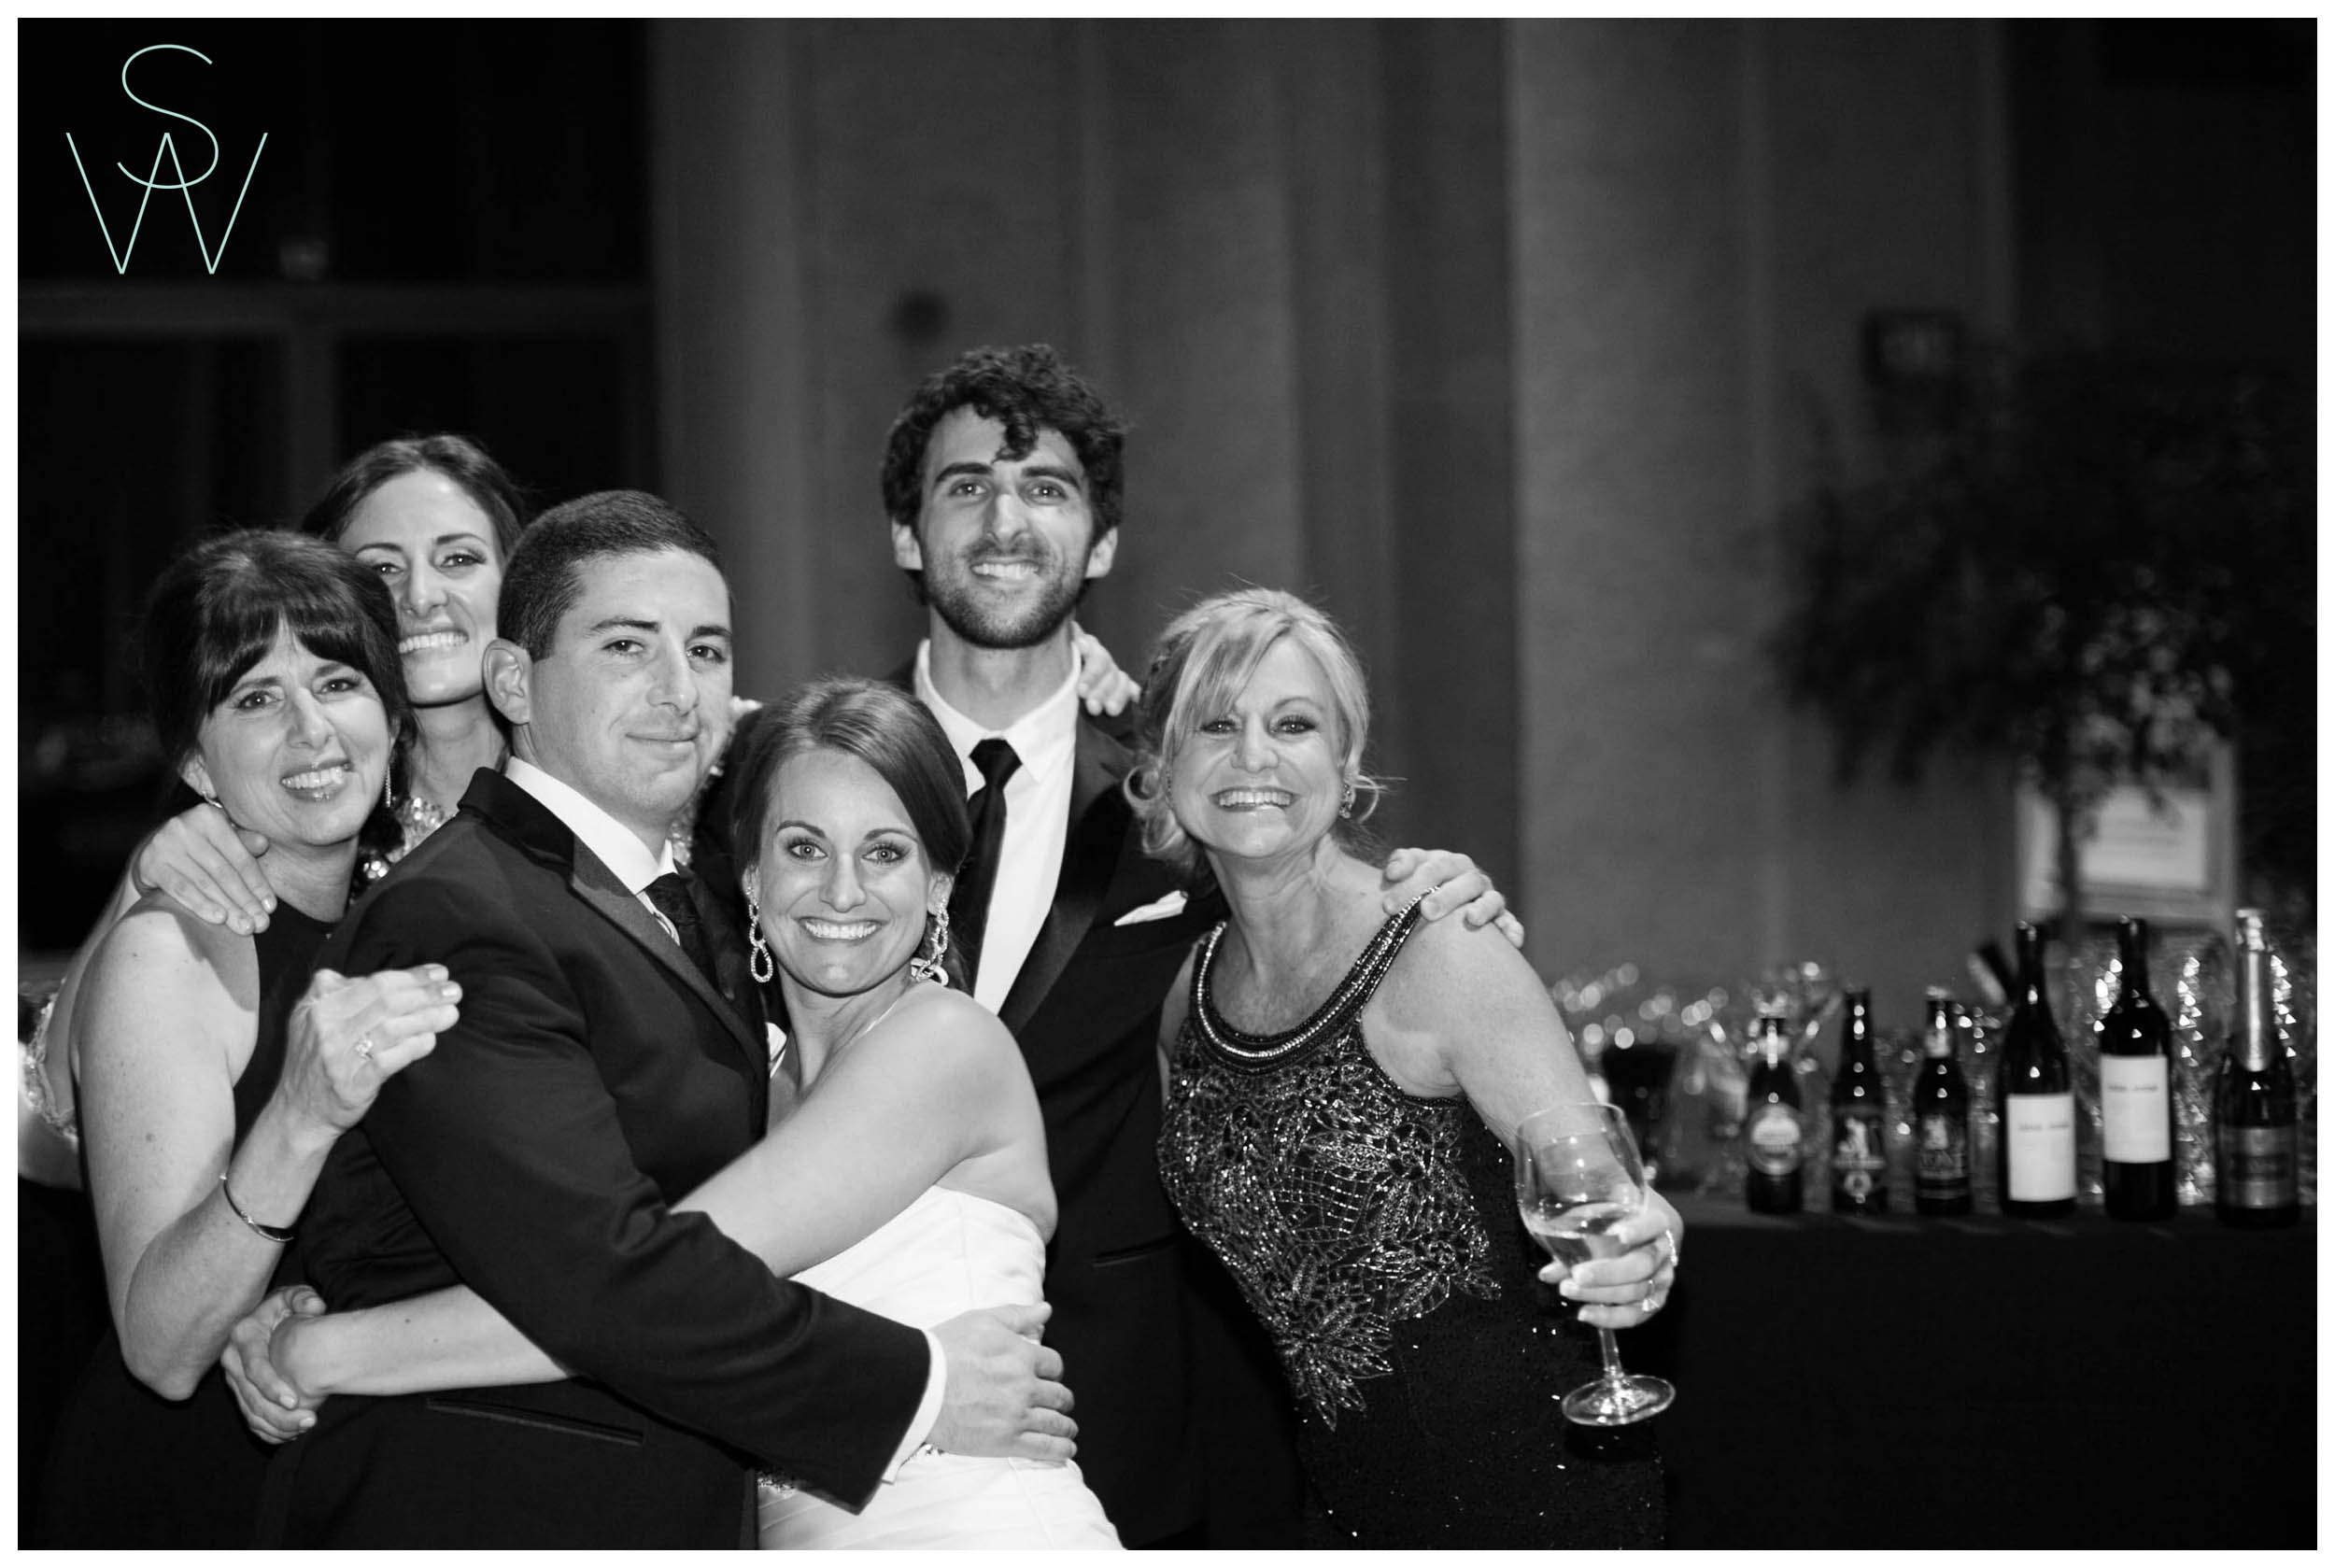 Shewanders.sdma_.wedding.photography-1102.jpg.wedding.photography-1102.jpg